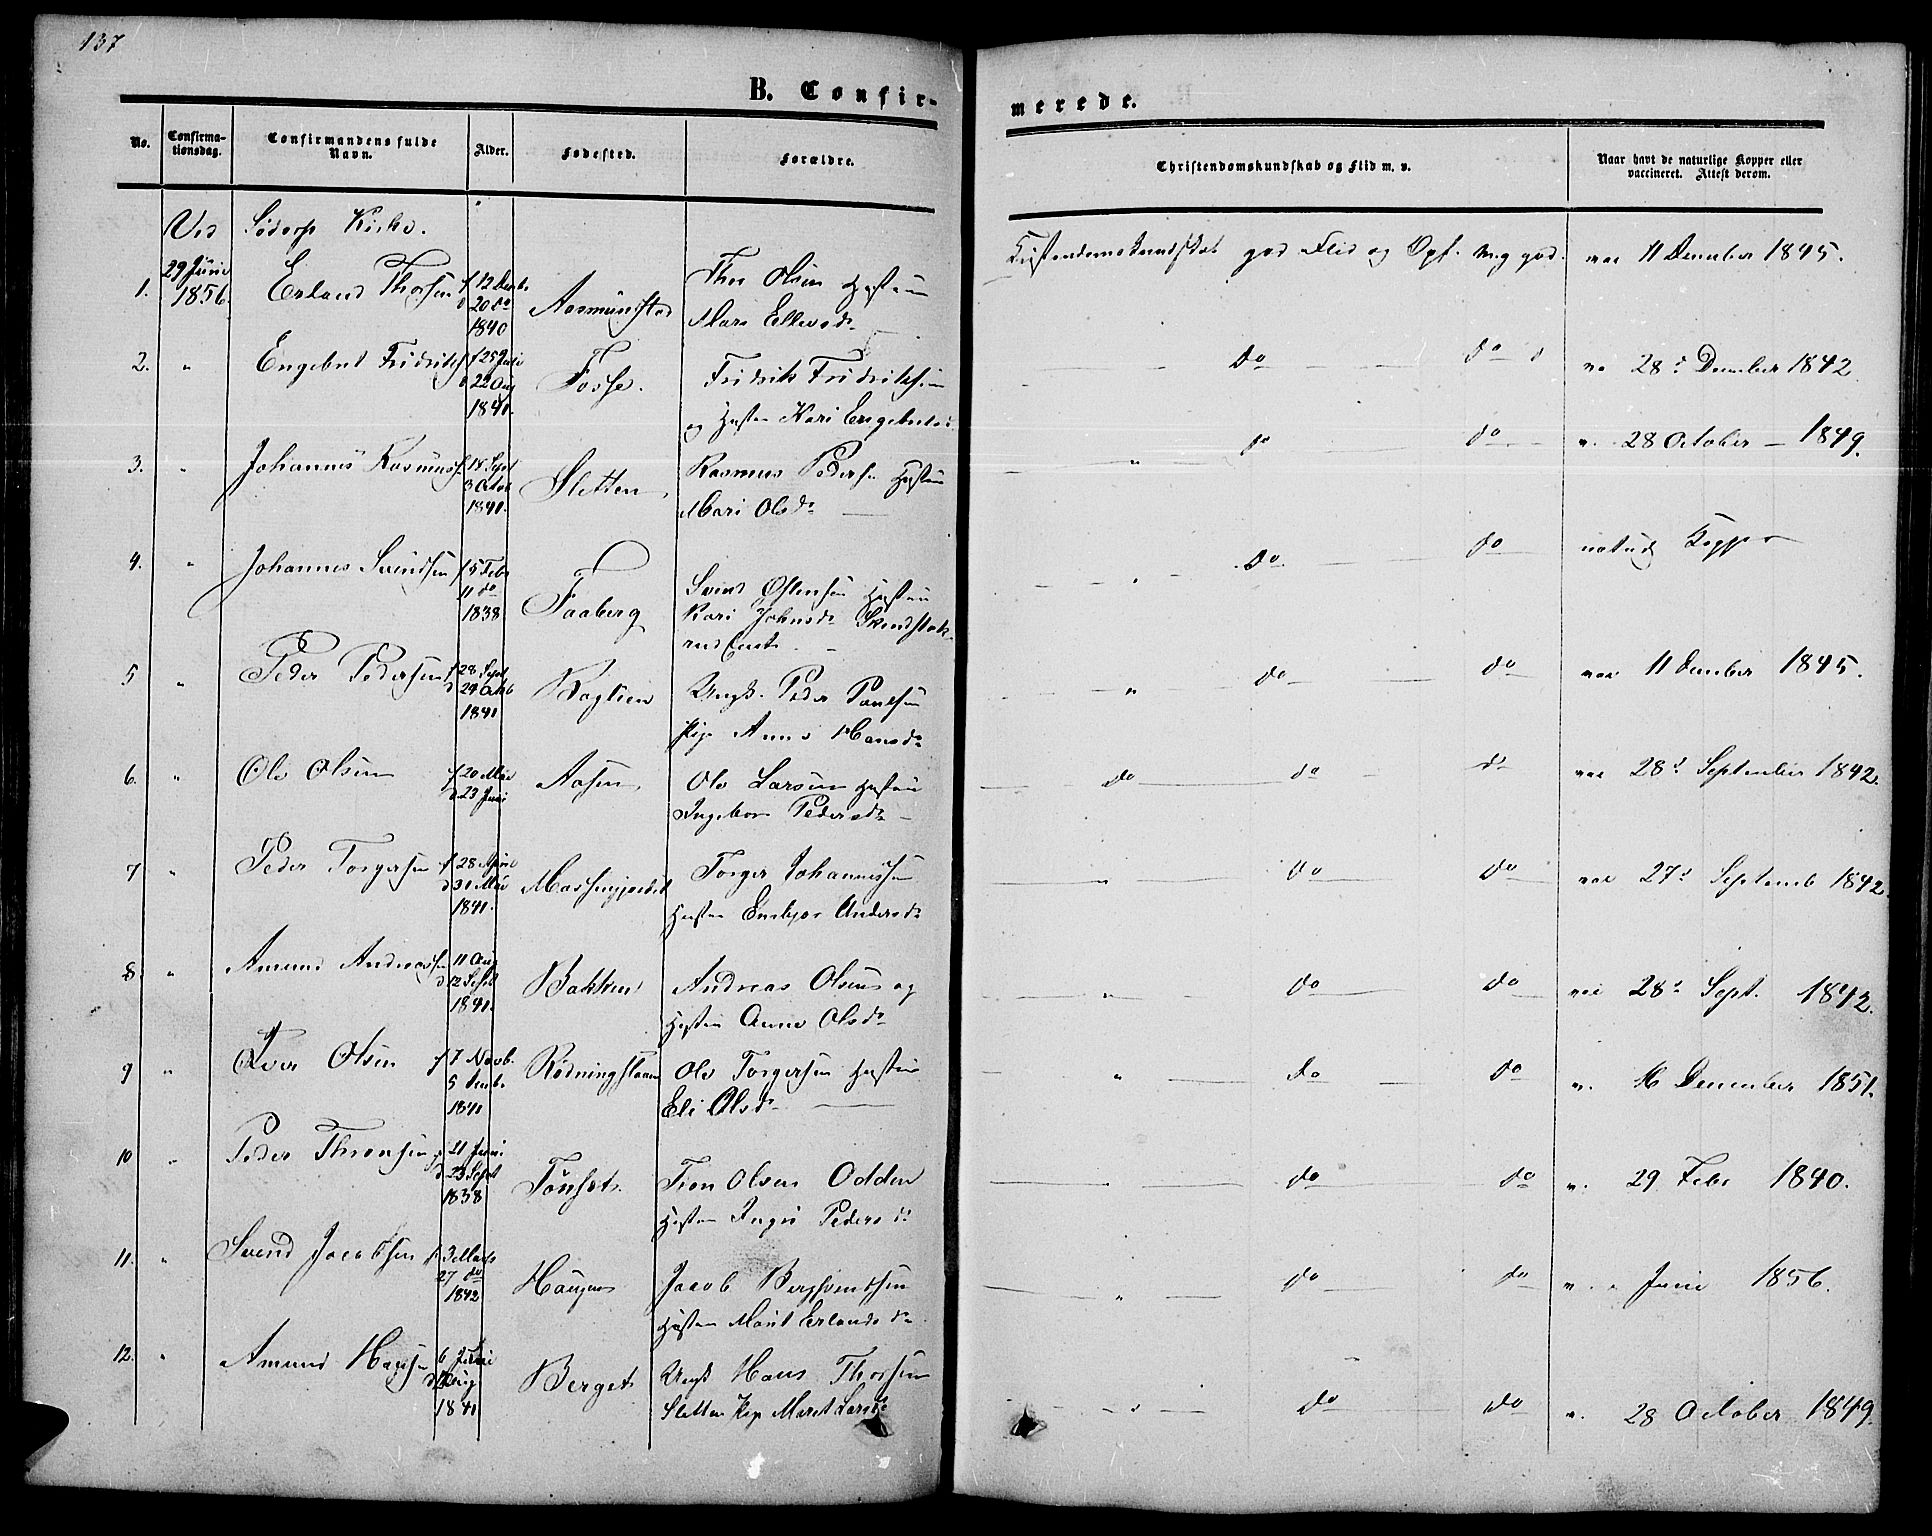 SAH, Nord-Fron prestekontor, Klokkerbok nr. 2, 1851-1883, s. 137